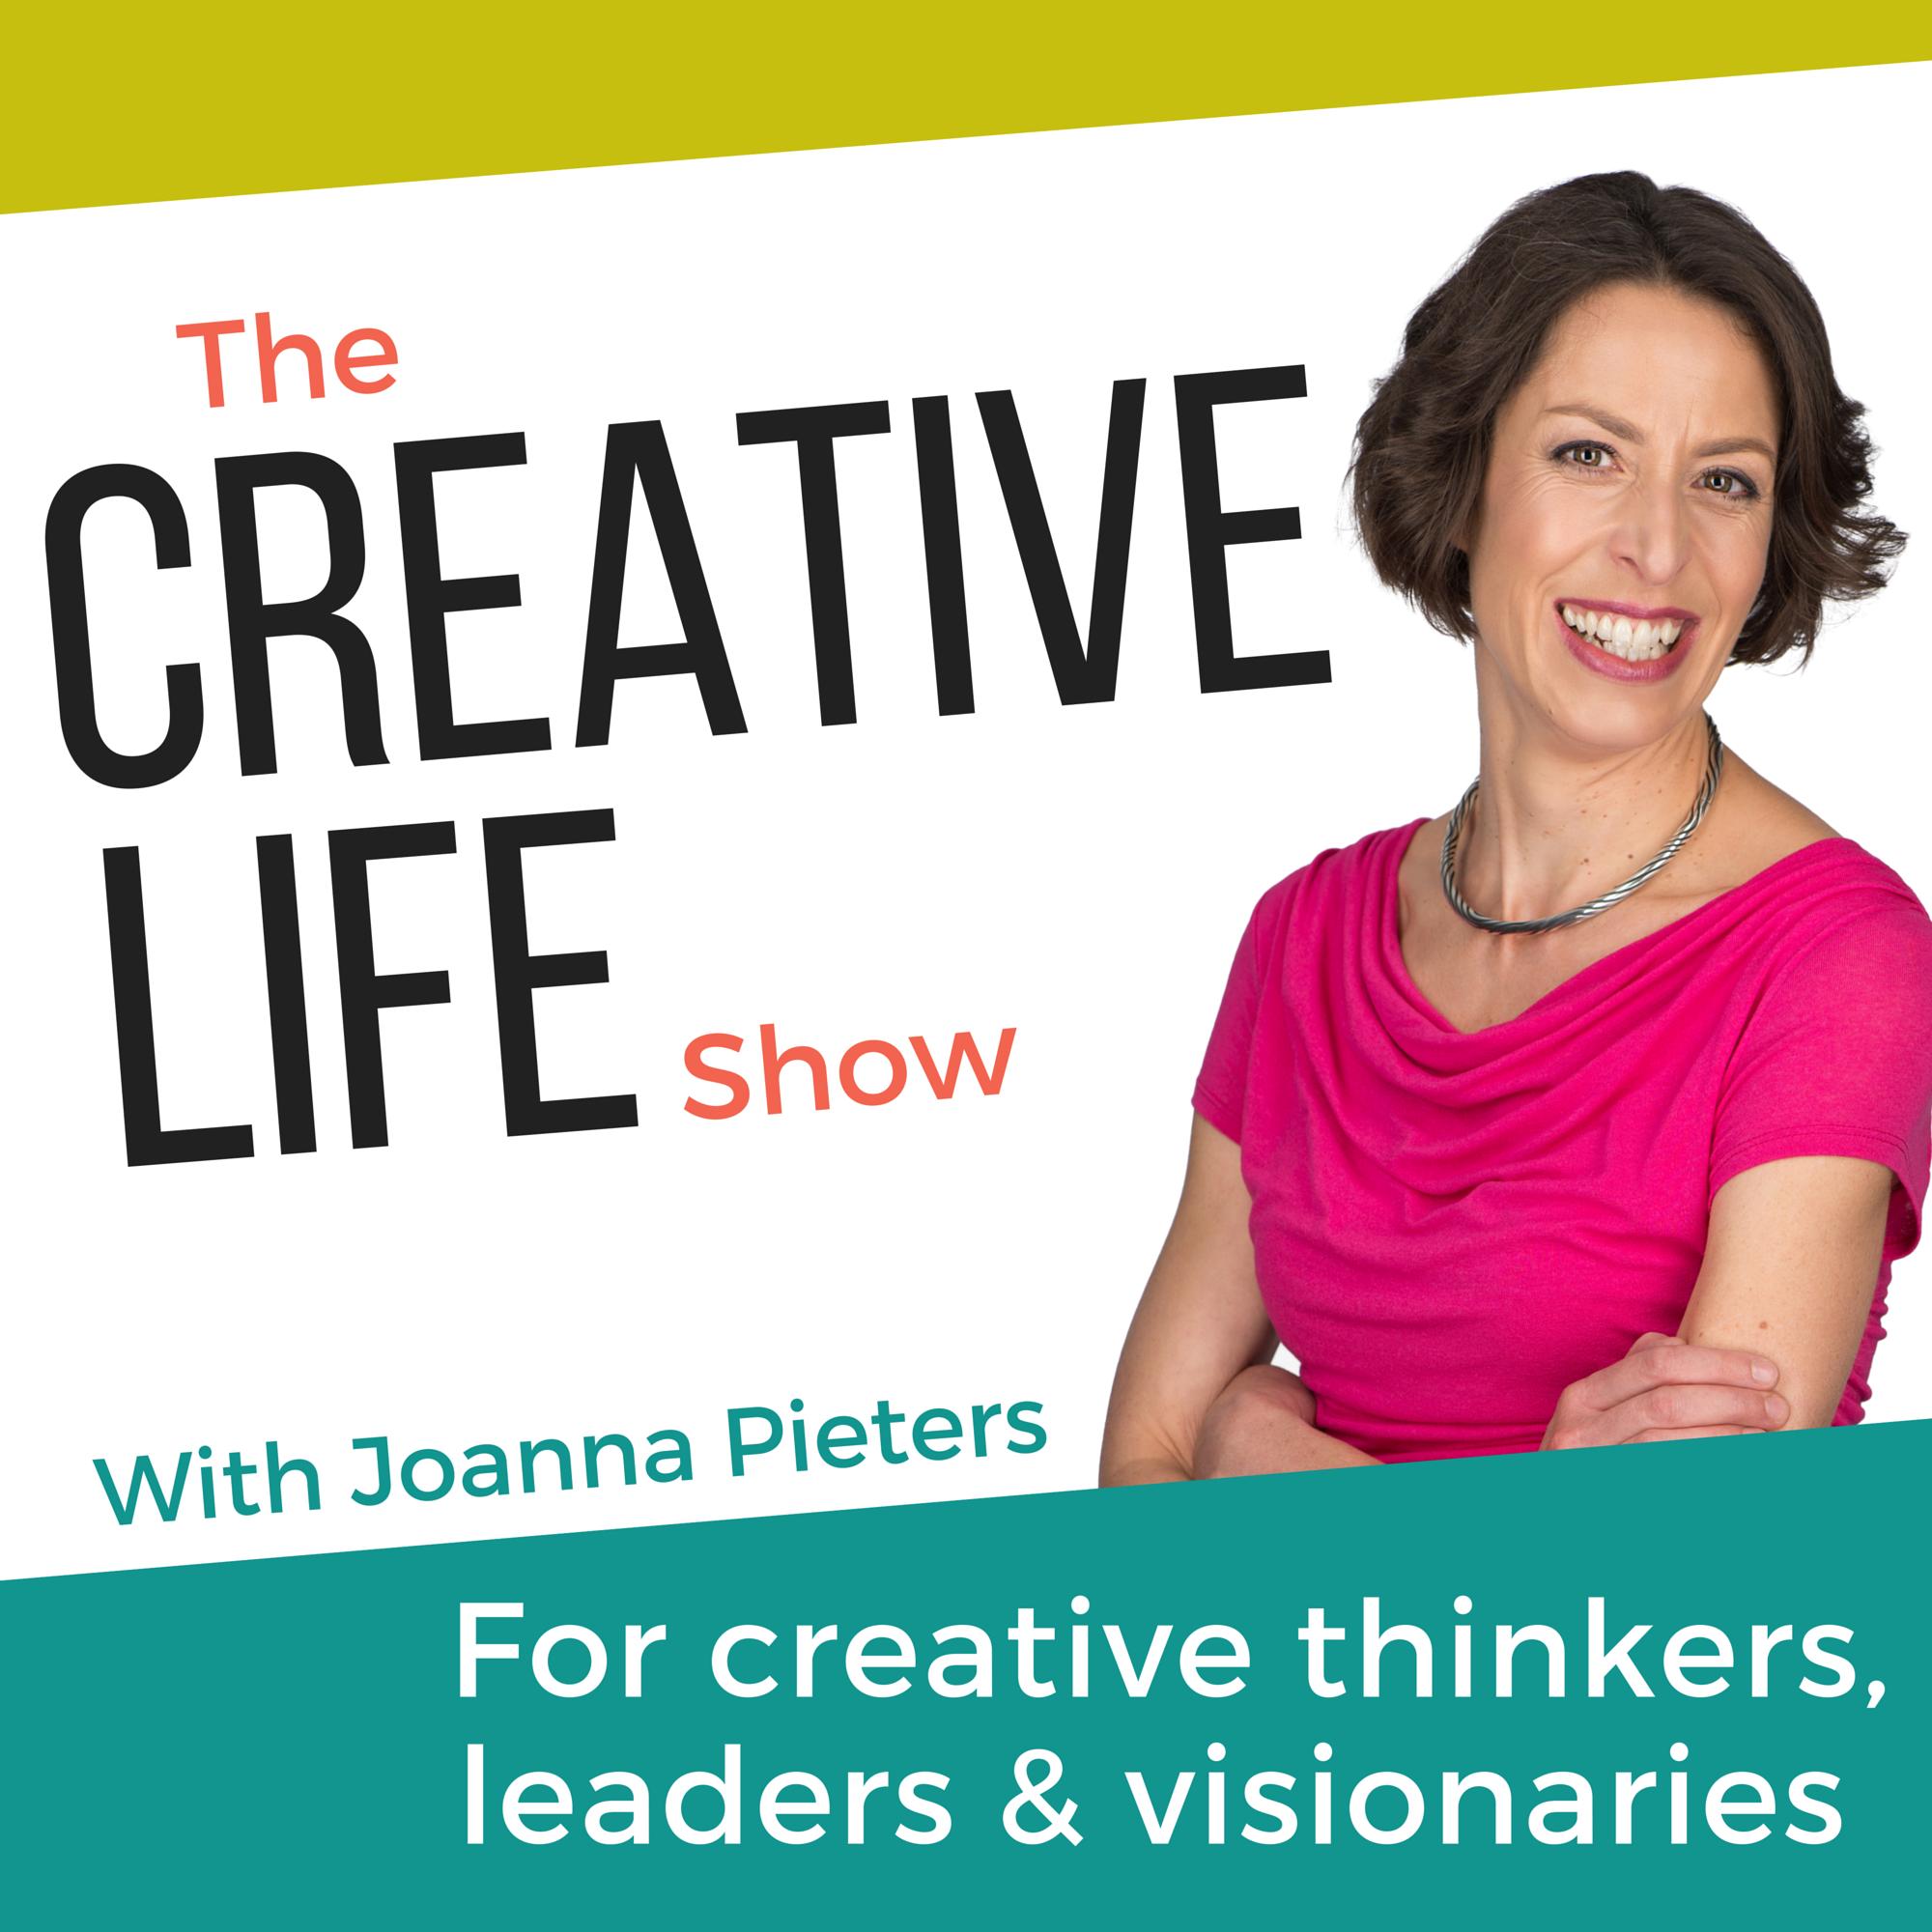 The Creative Life Show